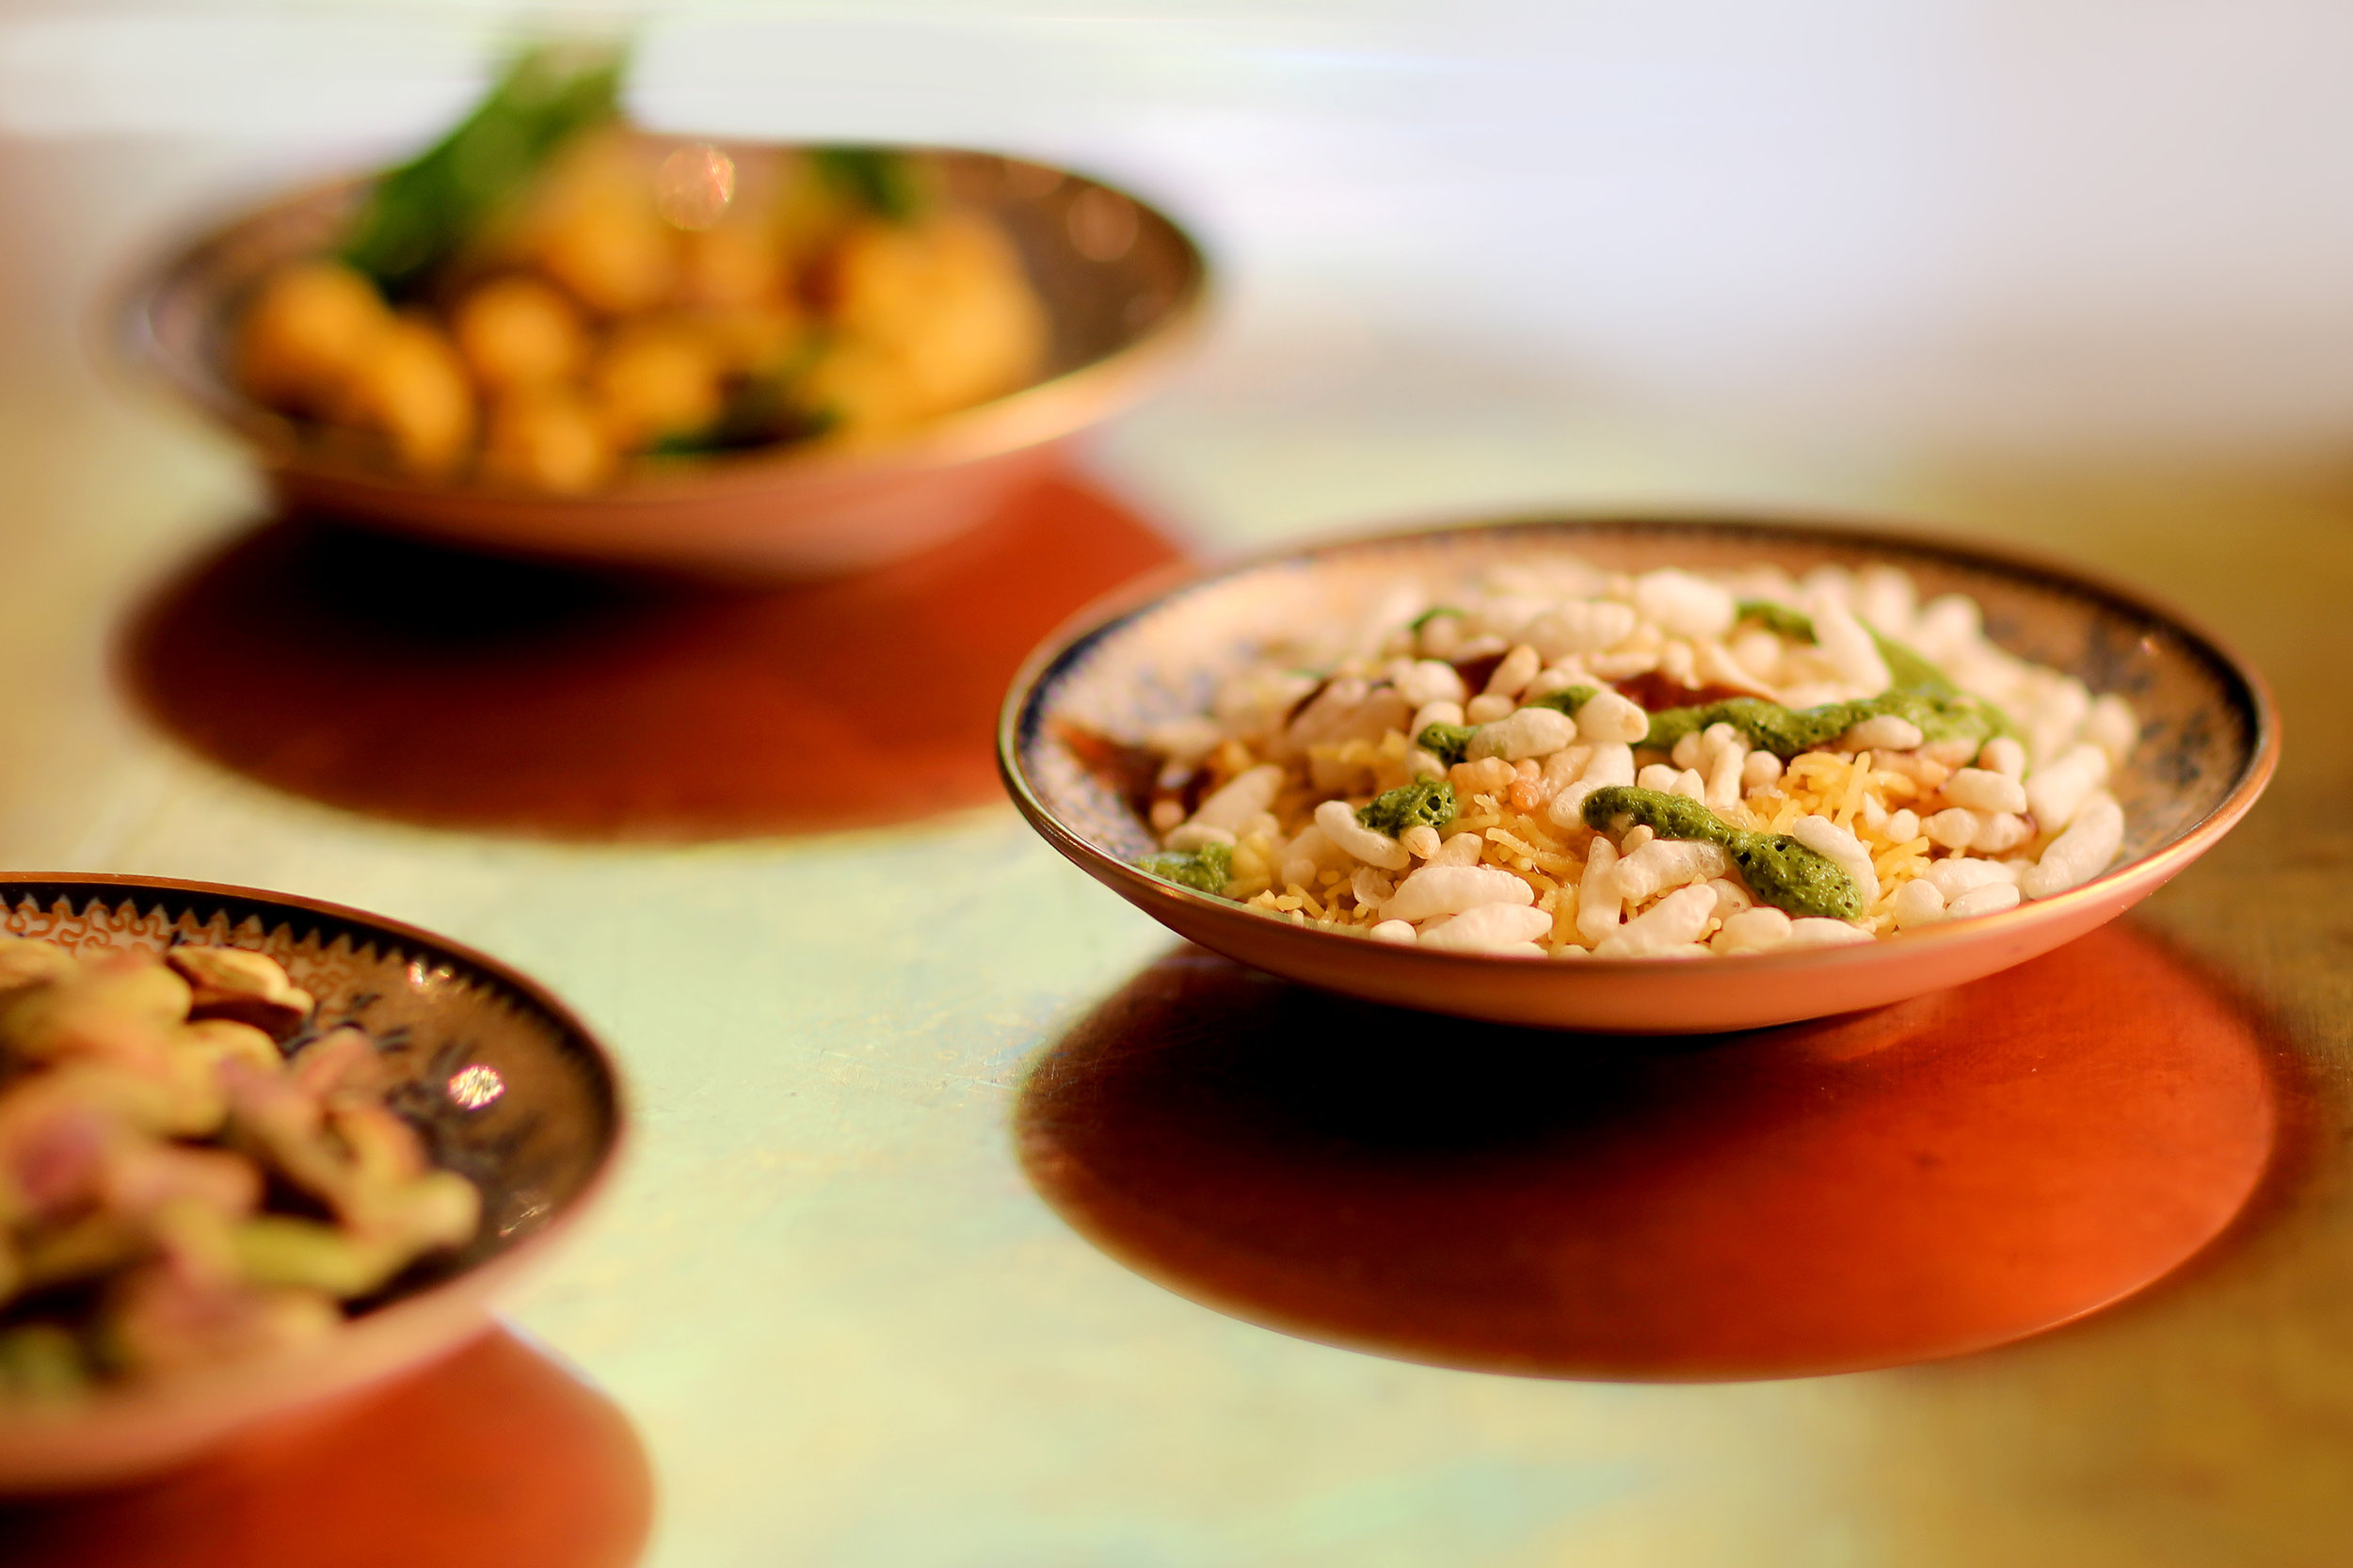 Spice Room-indian-food-cinnamon-rhinebeck-new-york-1.jpg